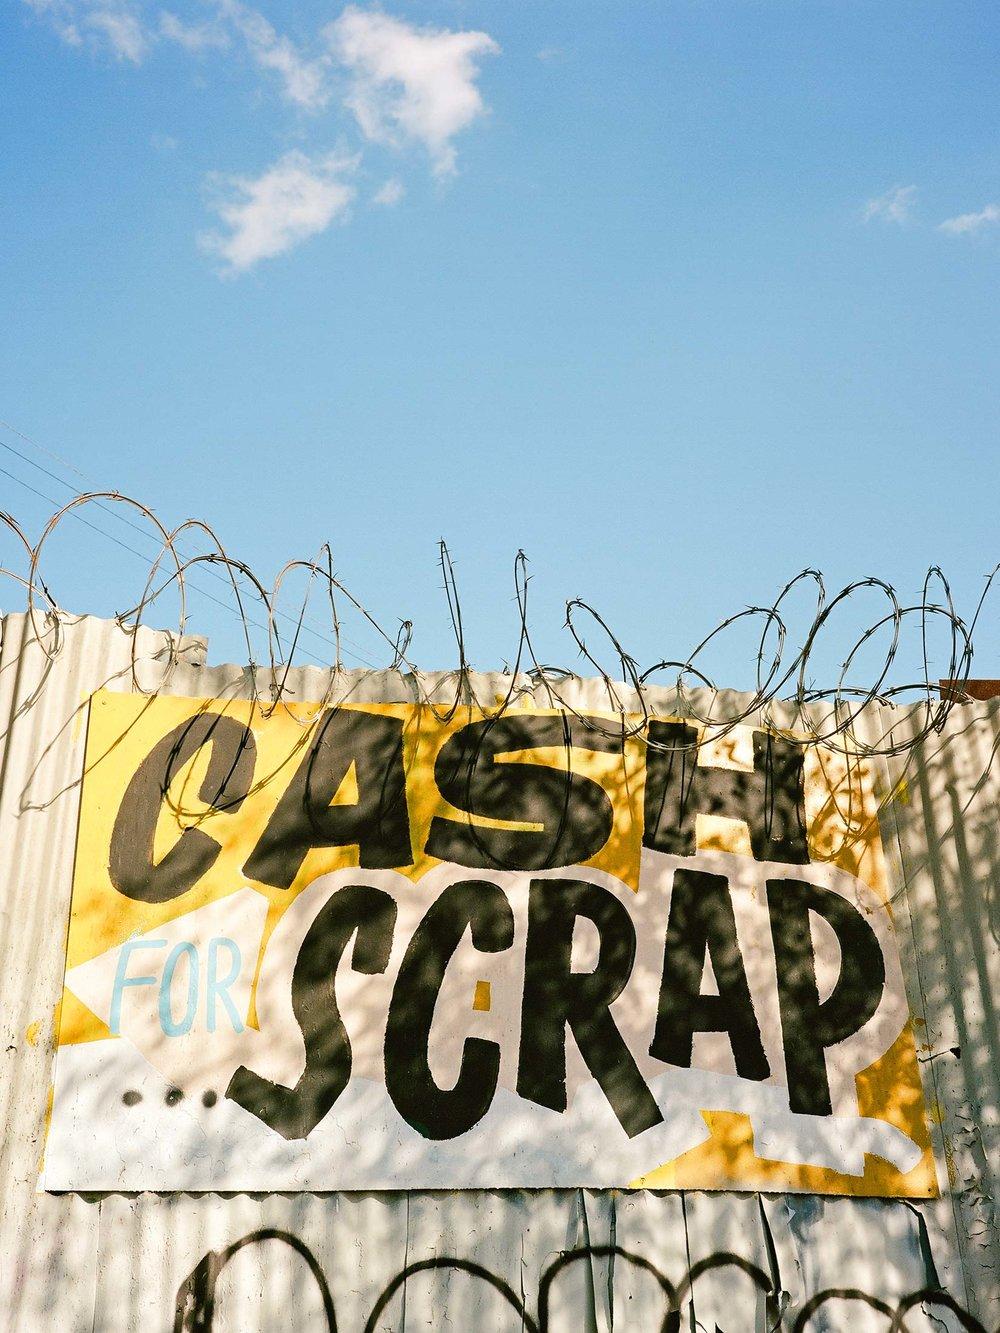 Cash_For_Scrap.jpg